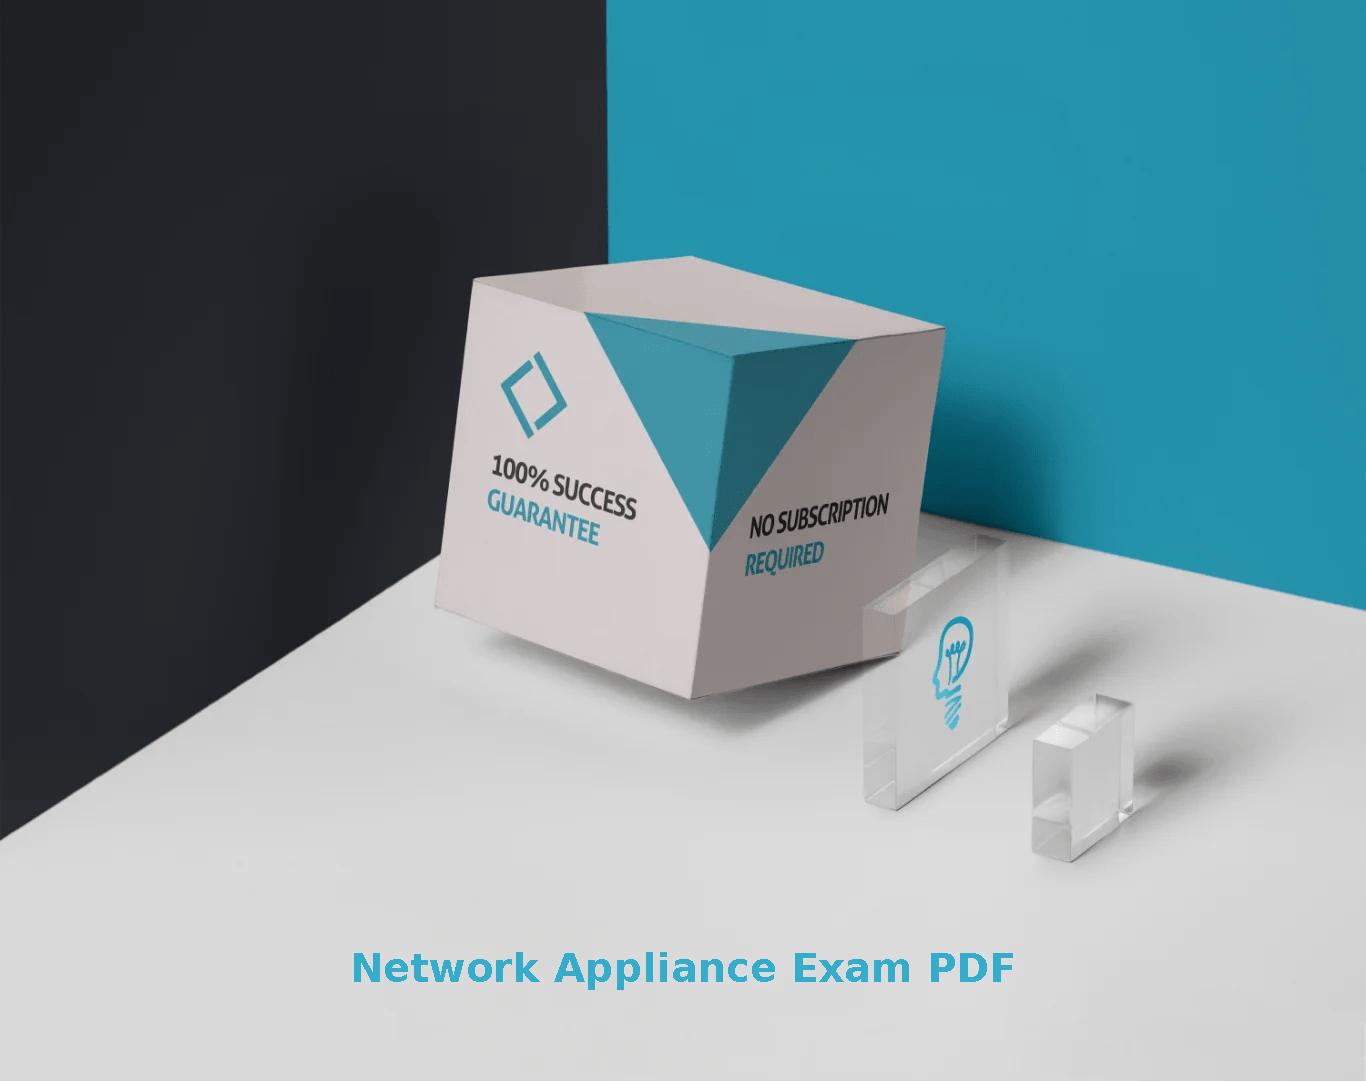 Network Appliance Exam PDF